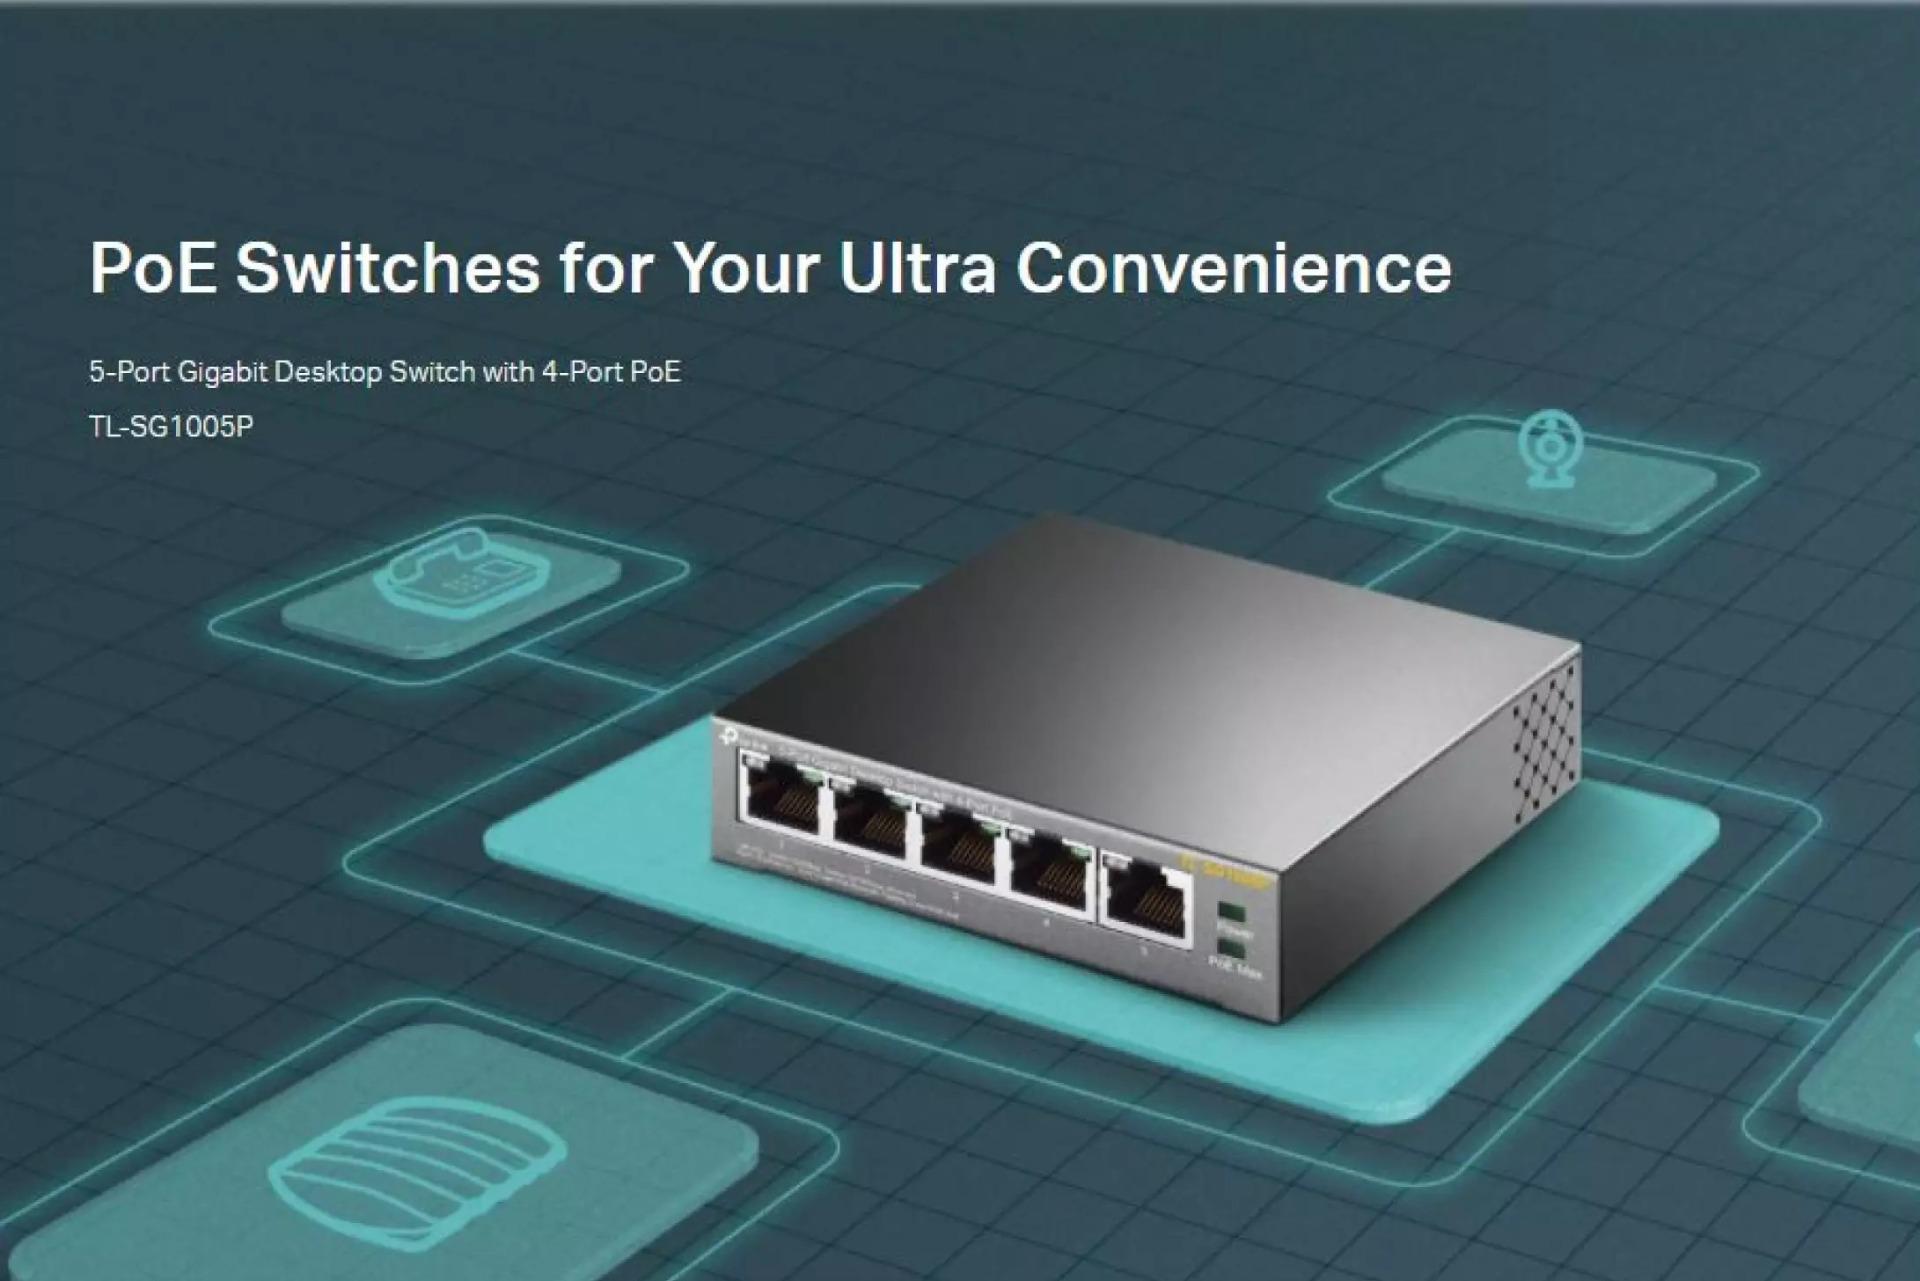 TP-Link TL-SG1005P Desktop Switch Intro